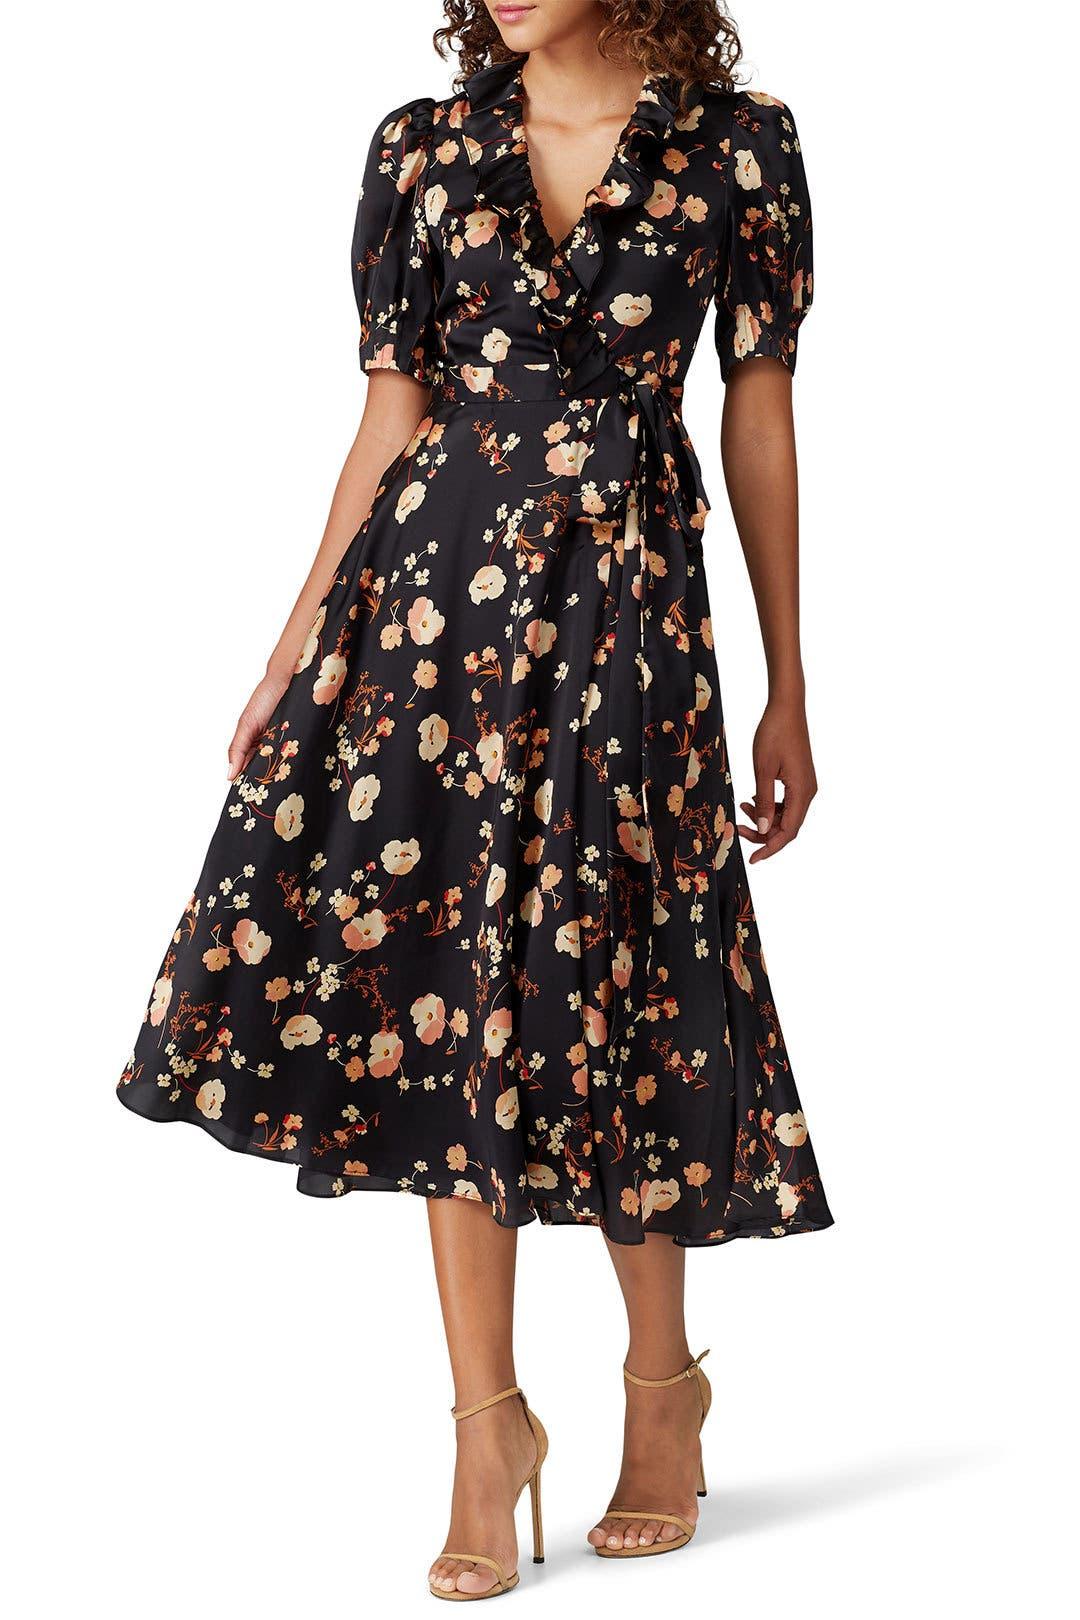 Jill Jill Stuart Womens Wrap Dress Anouk Print